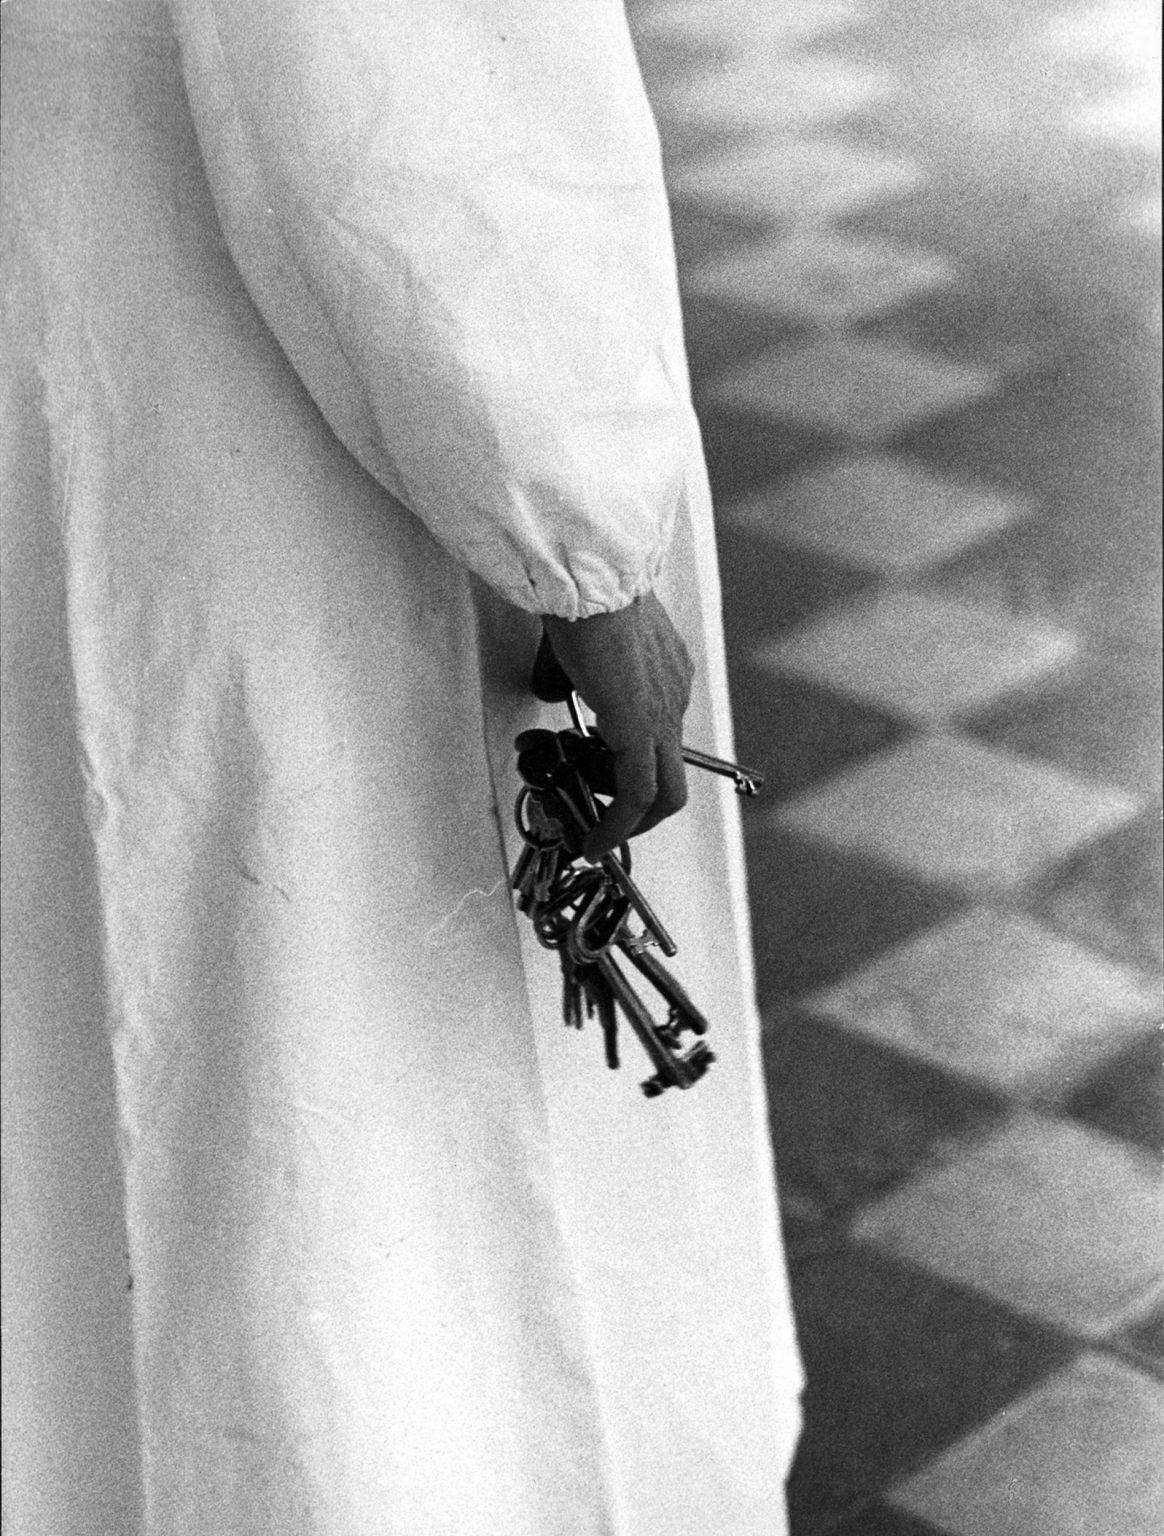 "Colorno (Parma), 1968-1969 - Inside a mental institution: a nurse holding keys. ><  Colorno (Parma), 1968-1969 - All'interno dell'istituto psichiatrico: un'inserviente tiene in mano delle chiavi.<p><span style=""color: #ff0000""><strong>*** SPECIAL   FEE   APPLIES ***</strong></span></p>"